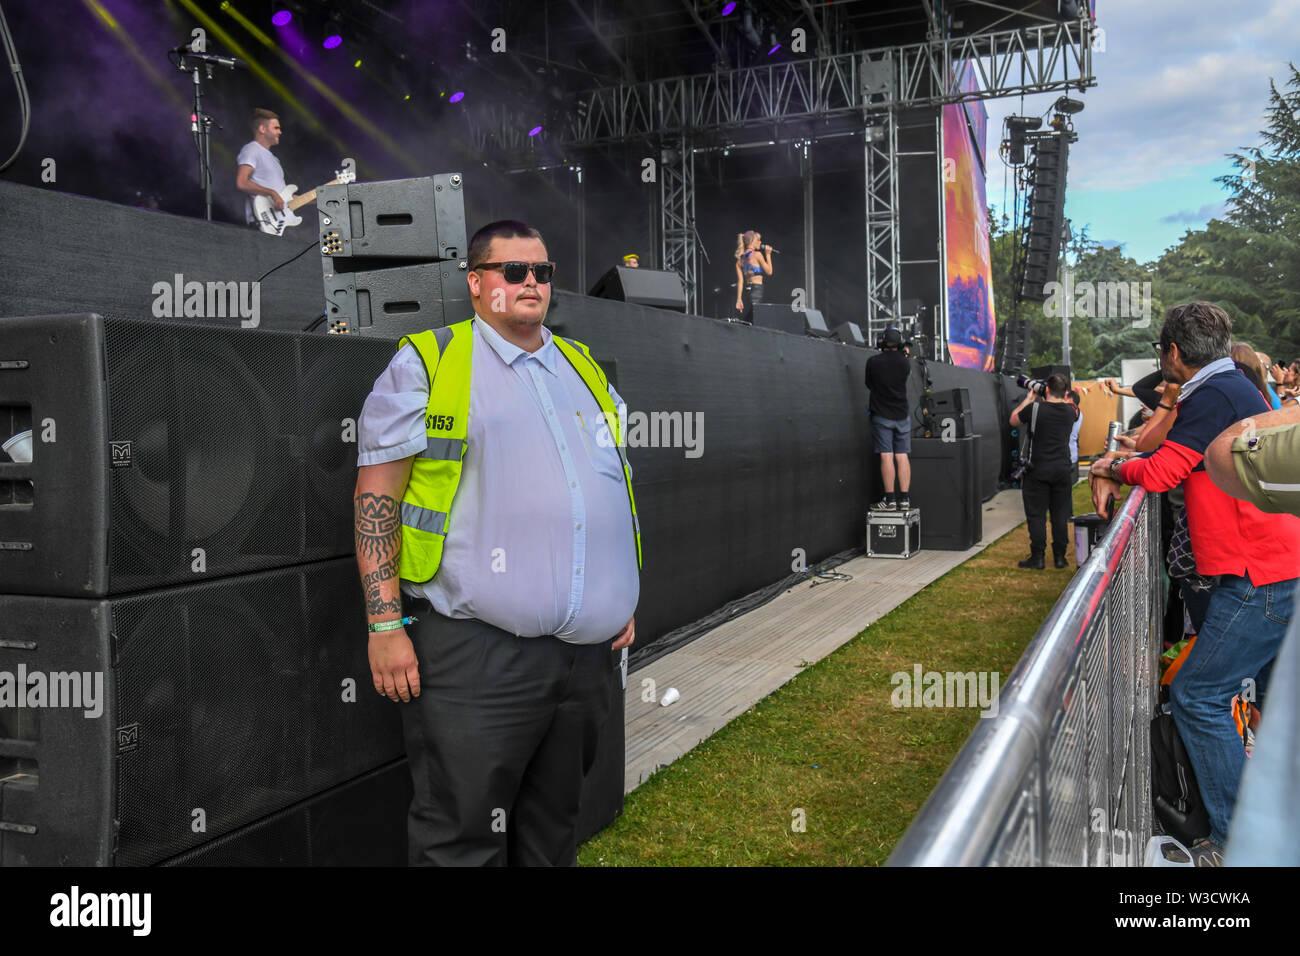 London, UK. 14th July 2019. Kerri Watt from Scotland performs at Kew the Music 2019 on 14 July 2019, London, UK. Credit: Picture Capital/Alamy Live News - Stock Image